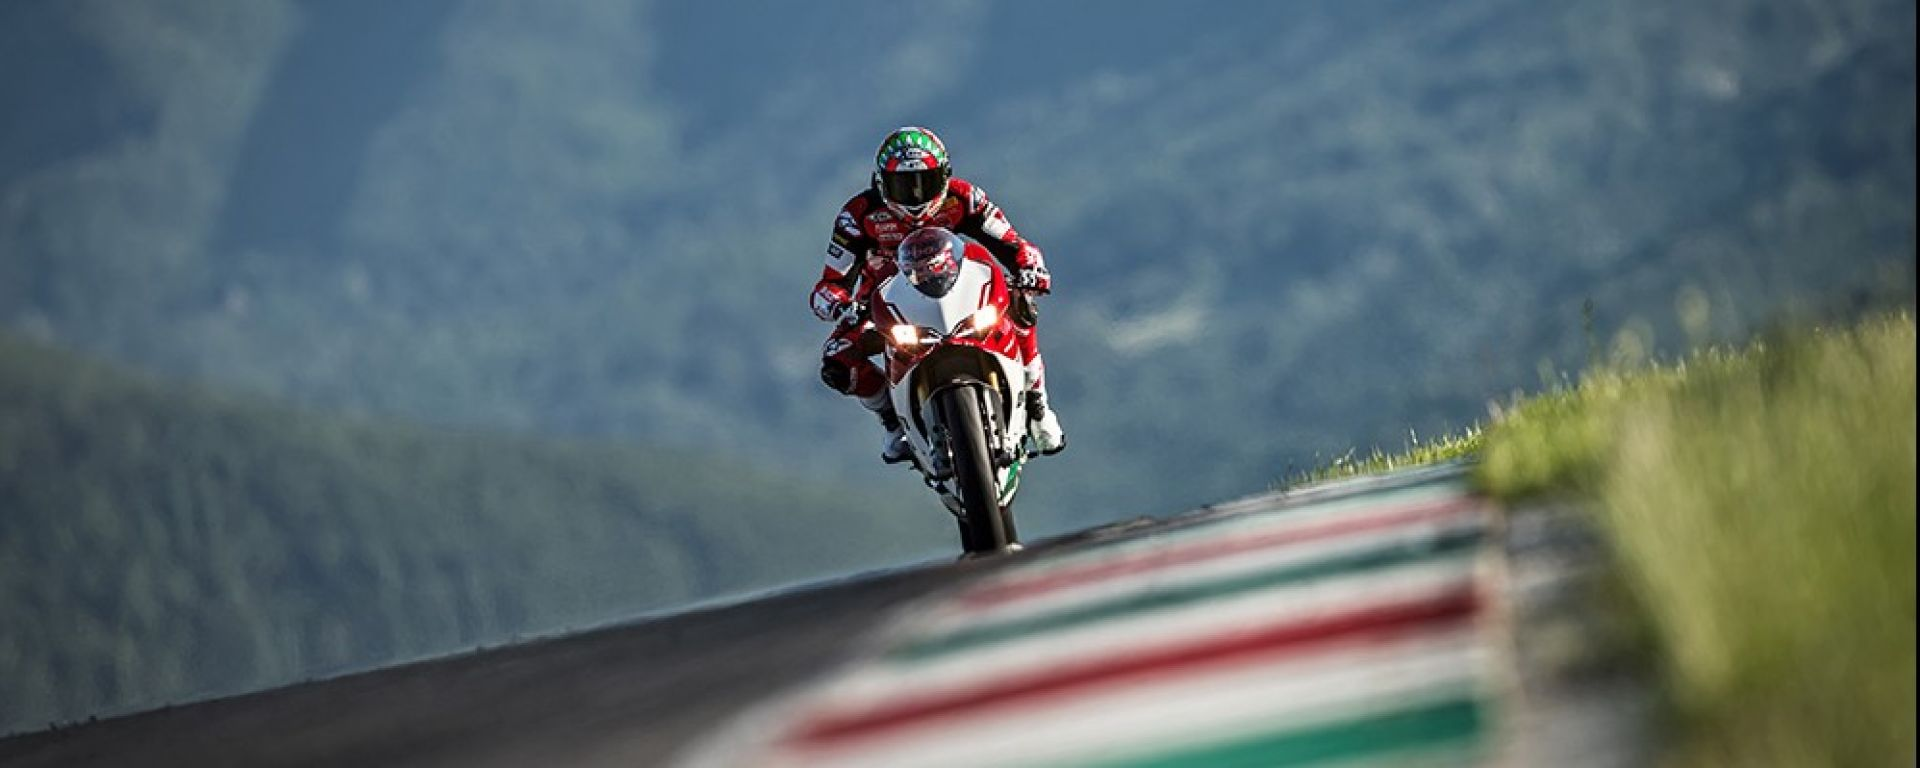 Ducati 1299 Panigale R Final Edition: le ultime nei Ducati Store